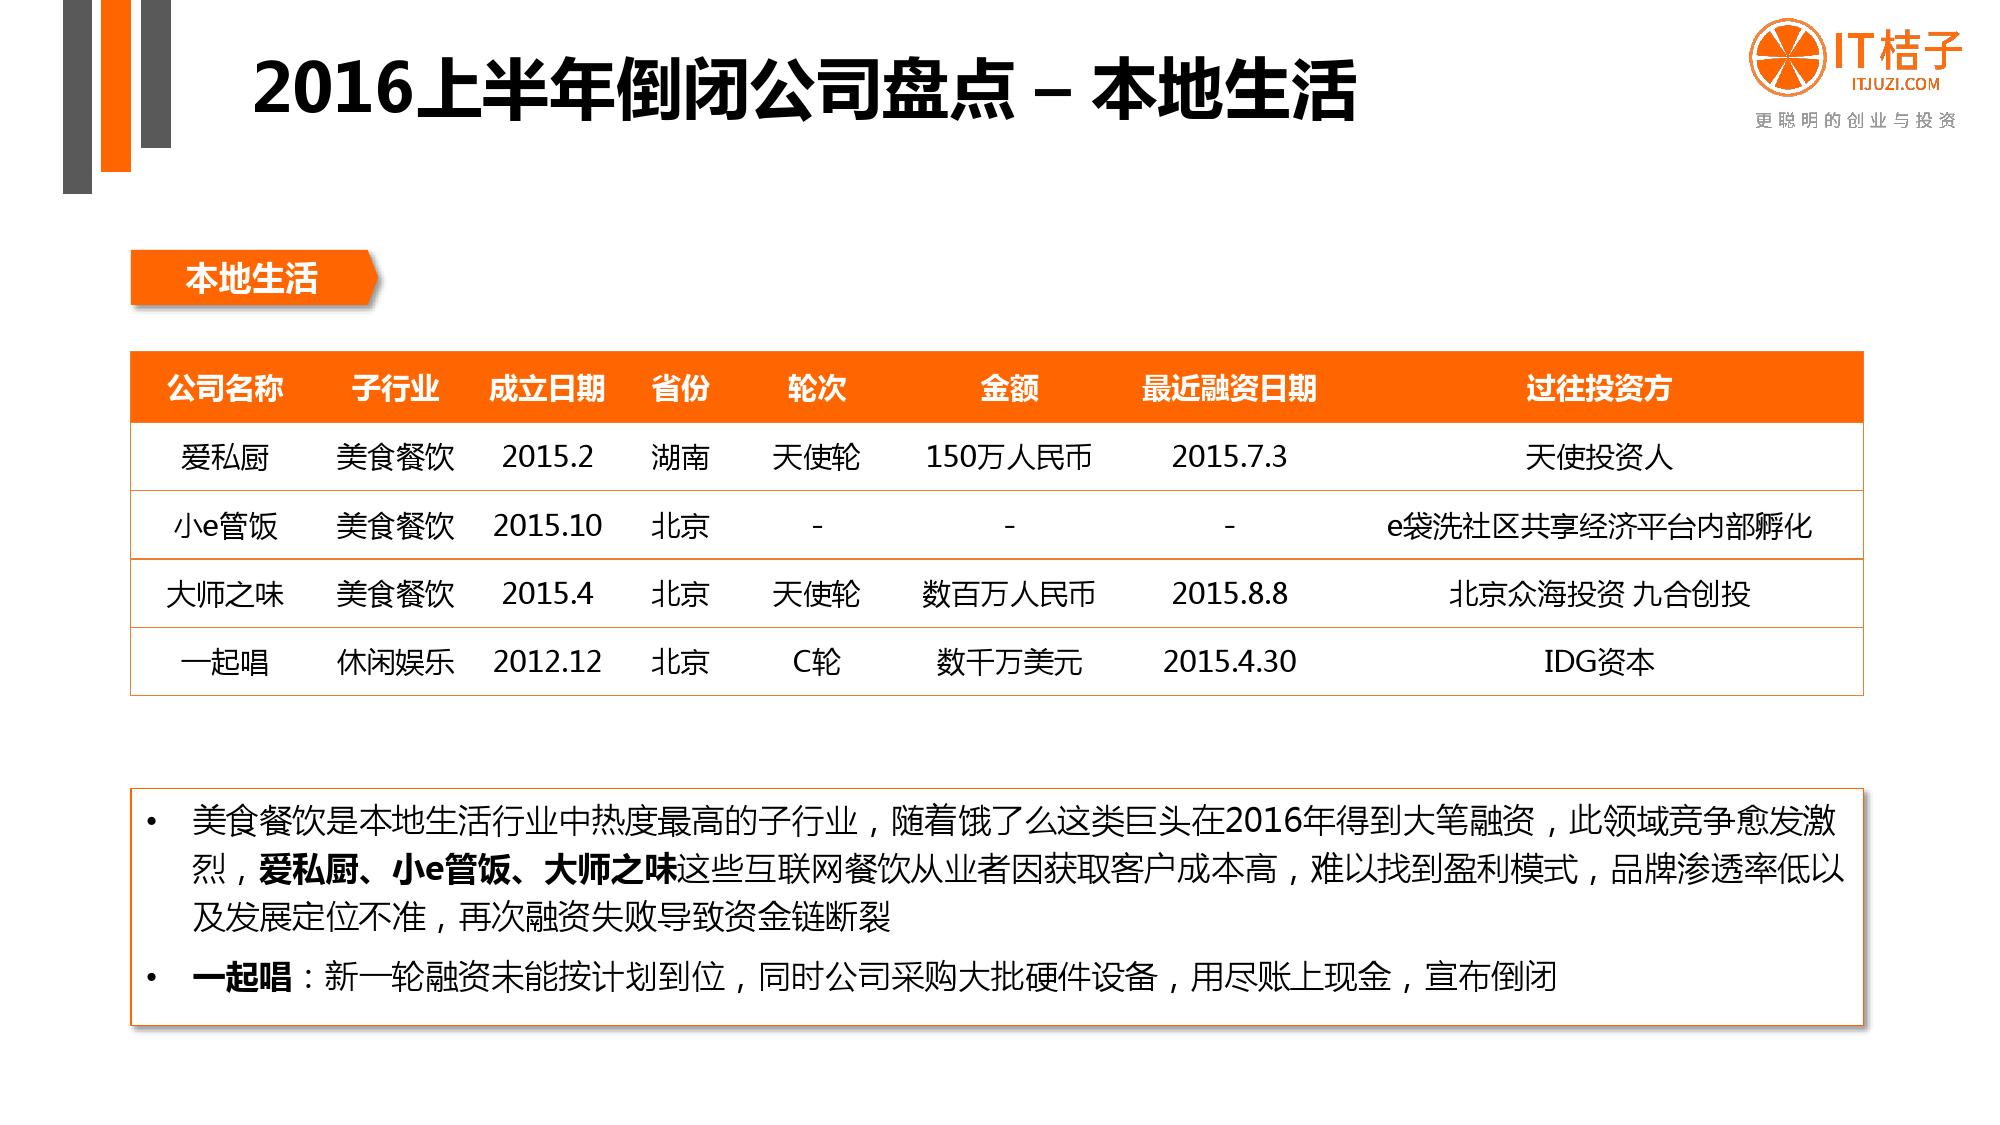 【IT桔子】2016年Q2中国互联网创业投资分析报告_000058